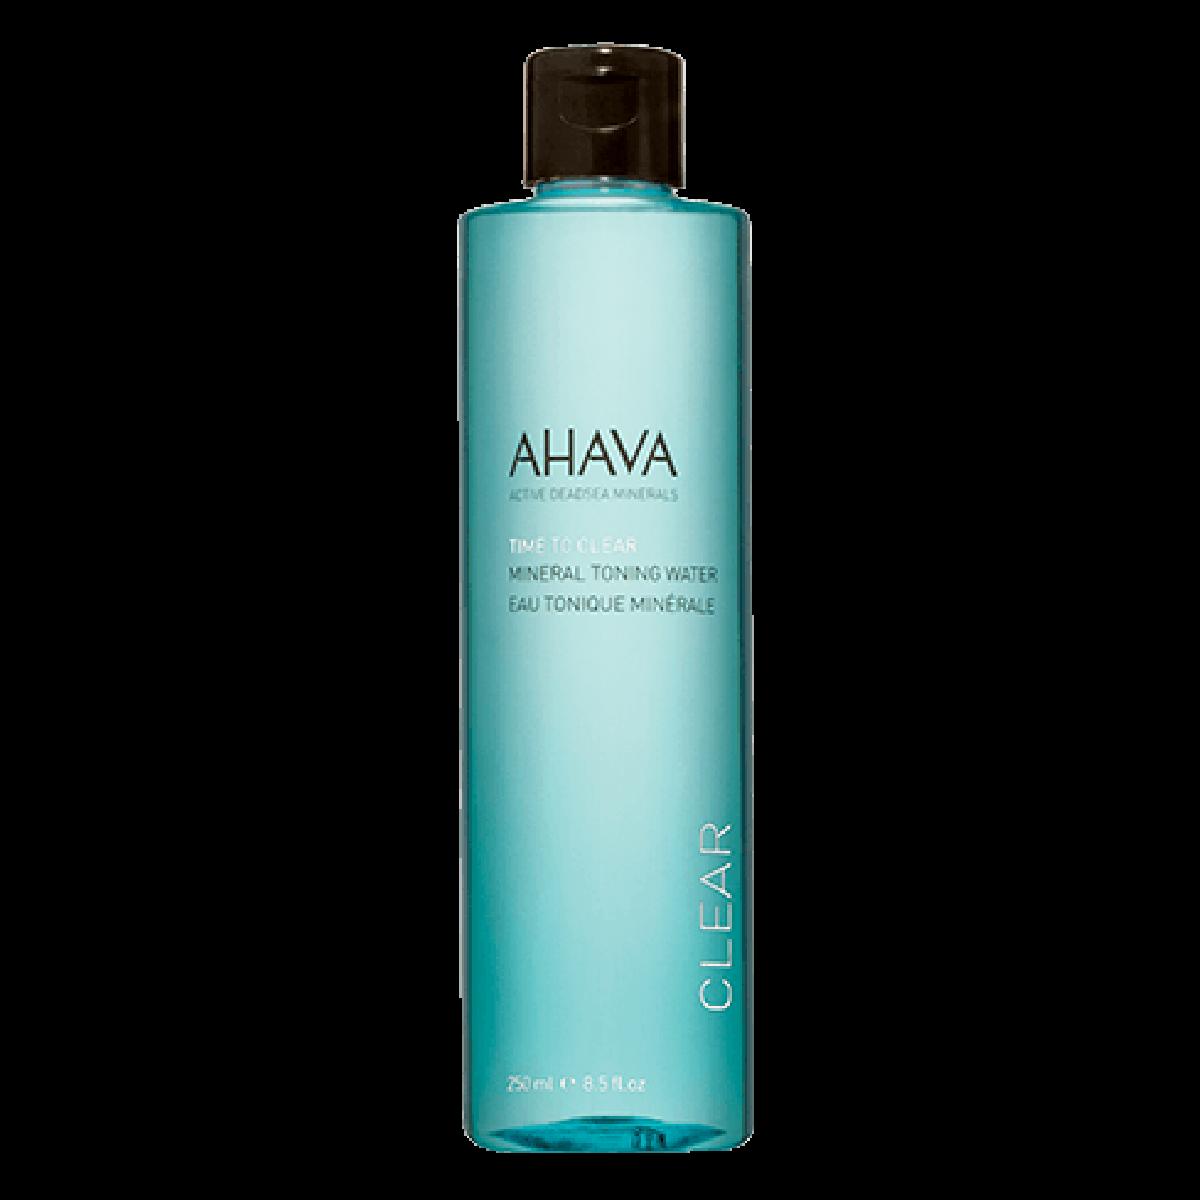 AHAVA - Mineral Toning Water 250 ml